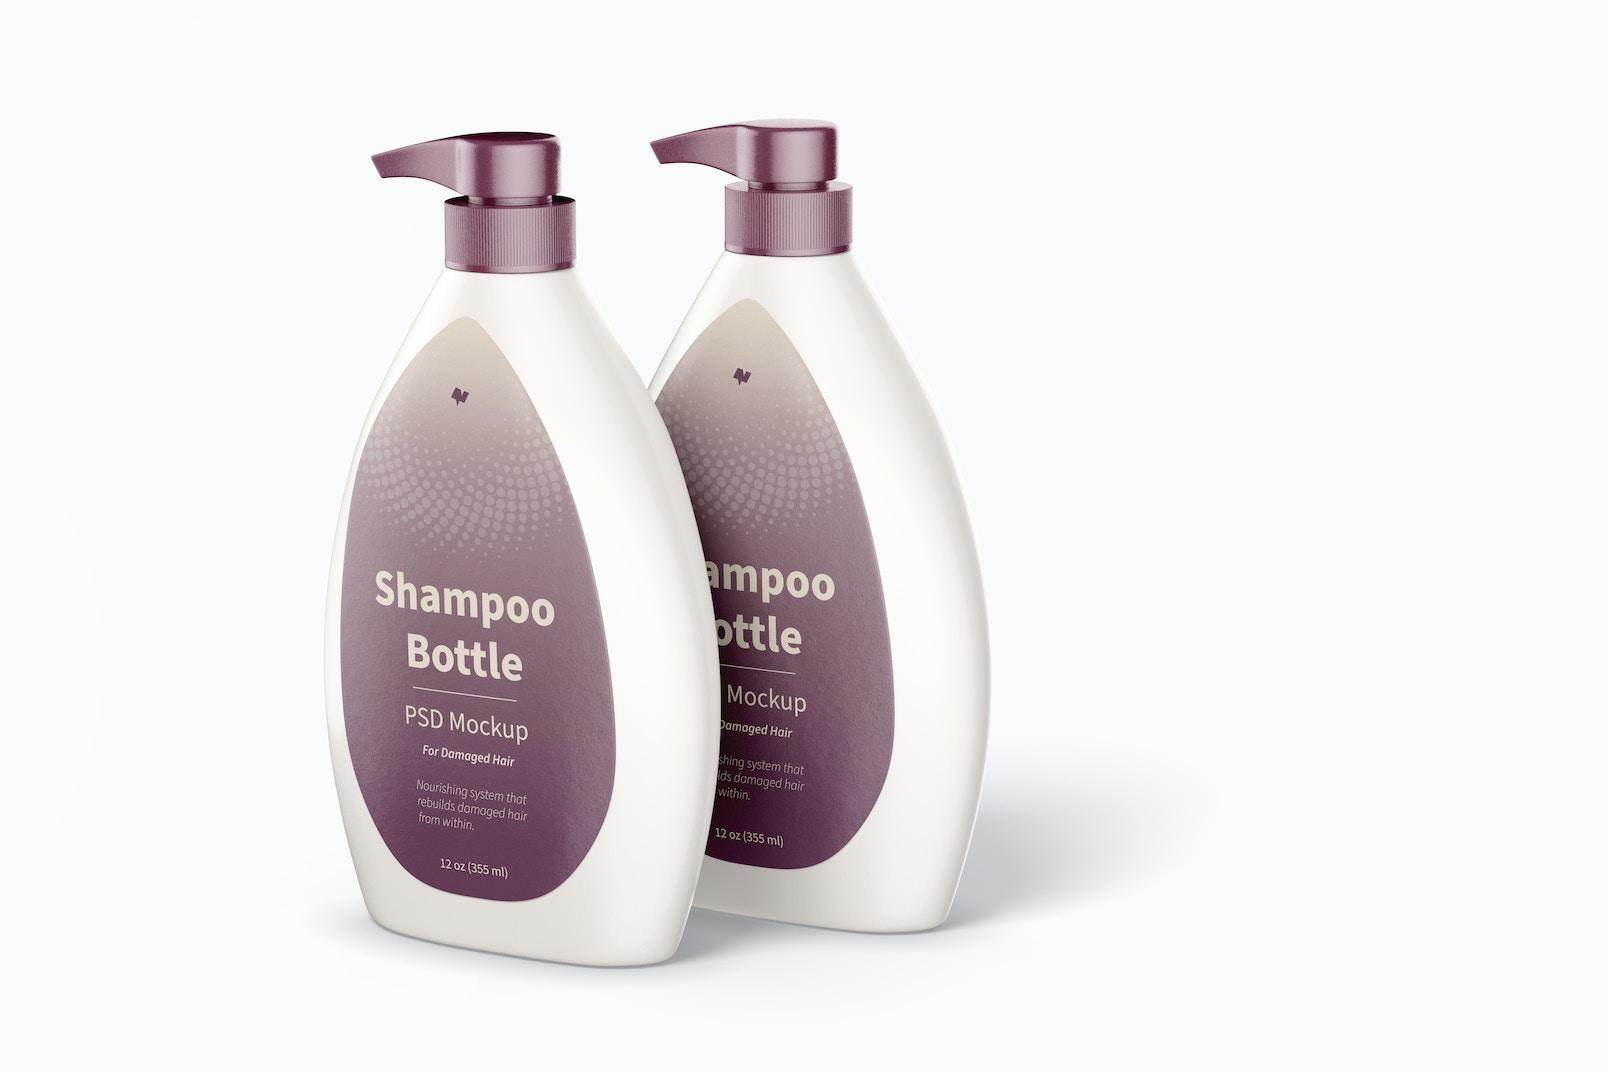 Shampoo Bottles with Pump Mockup